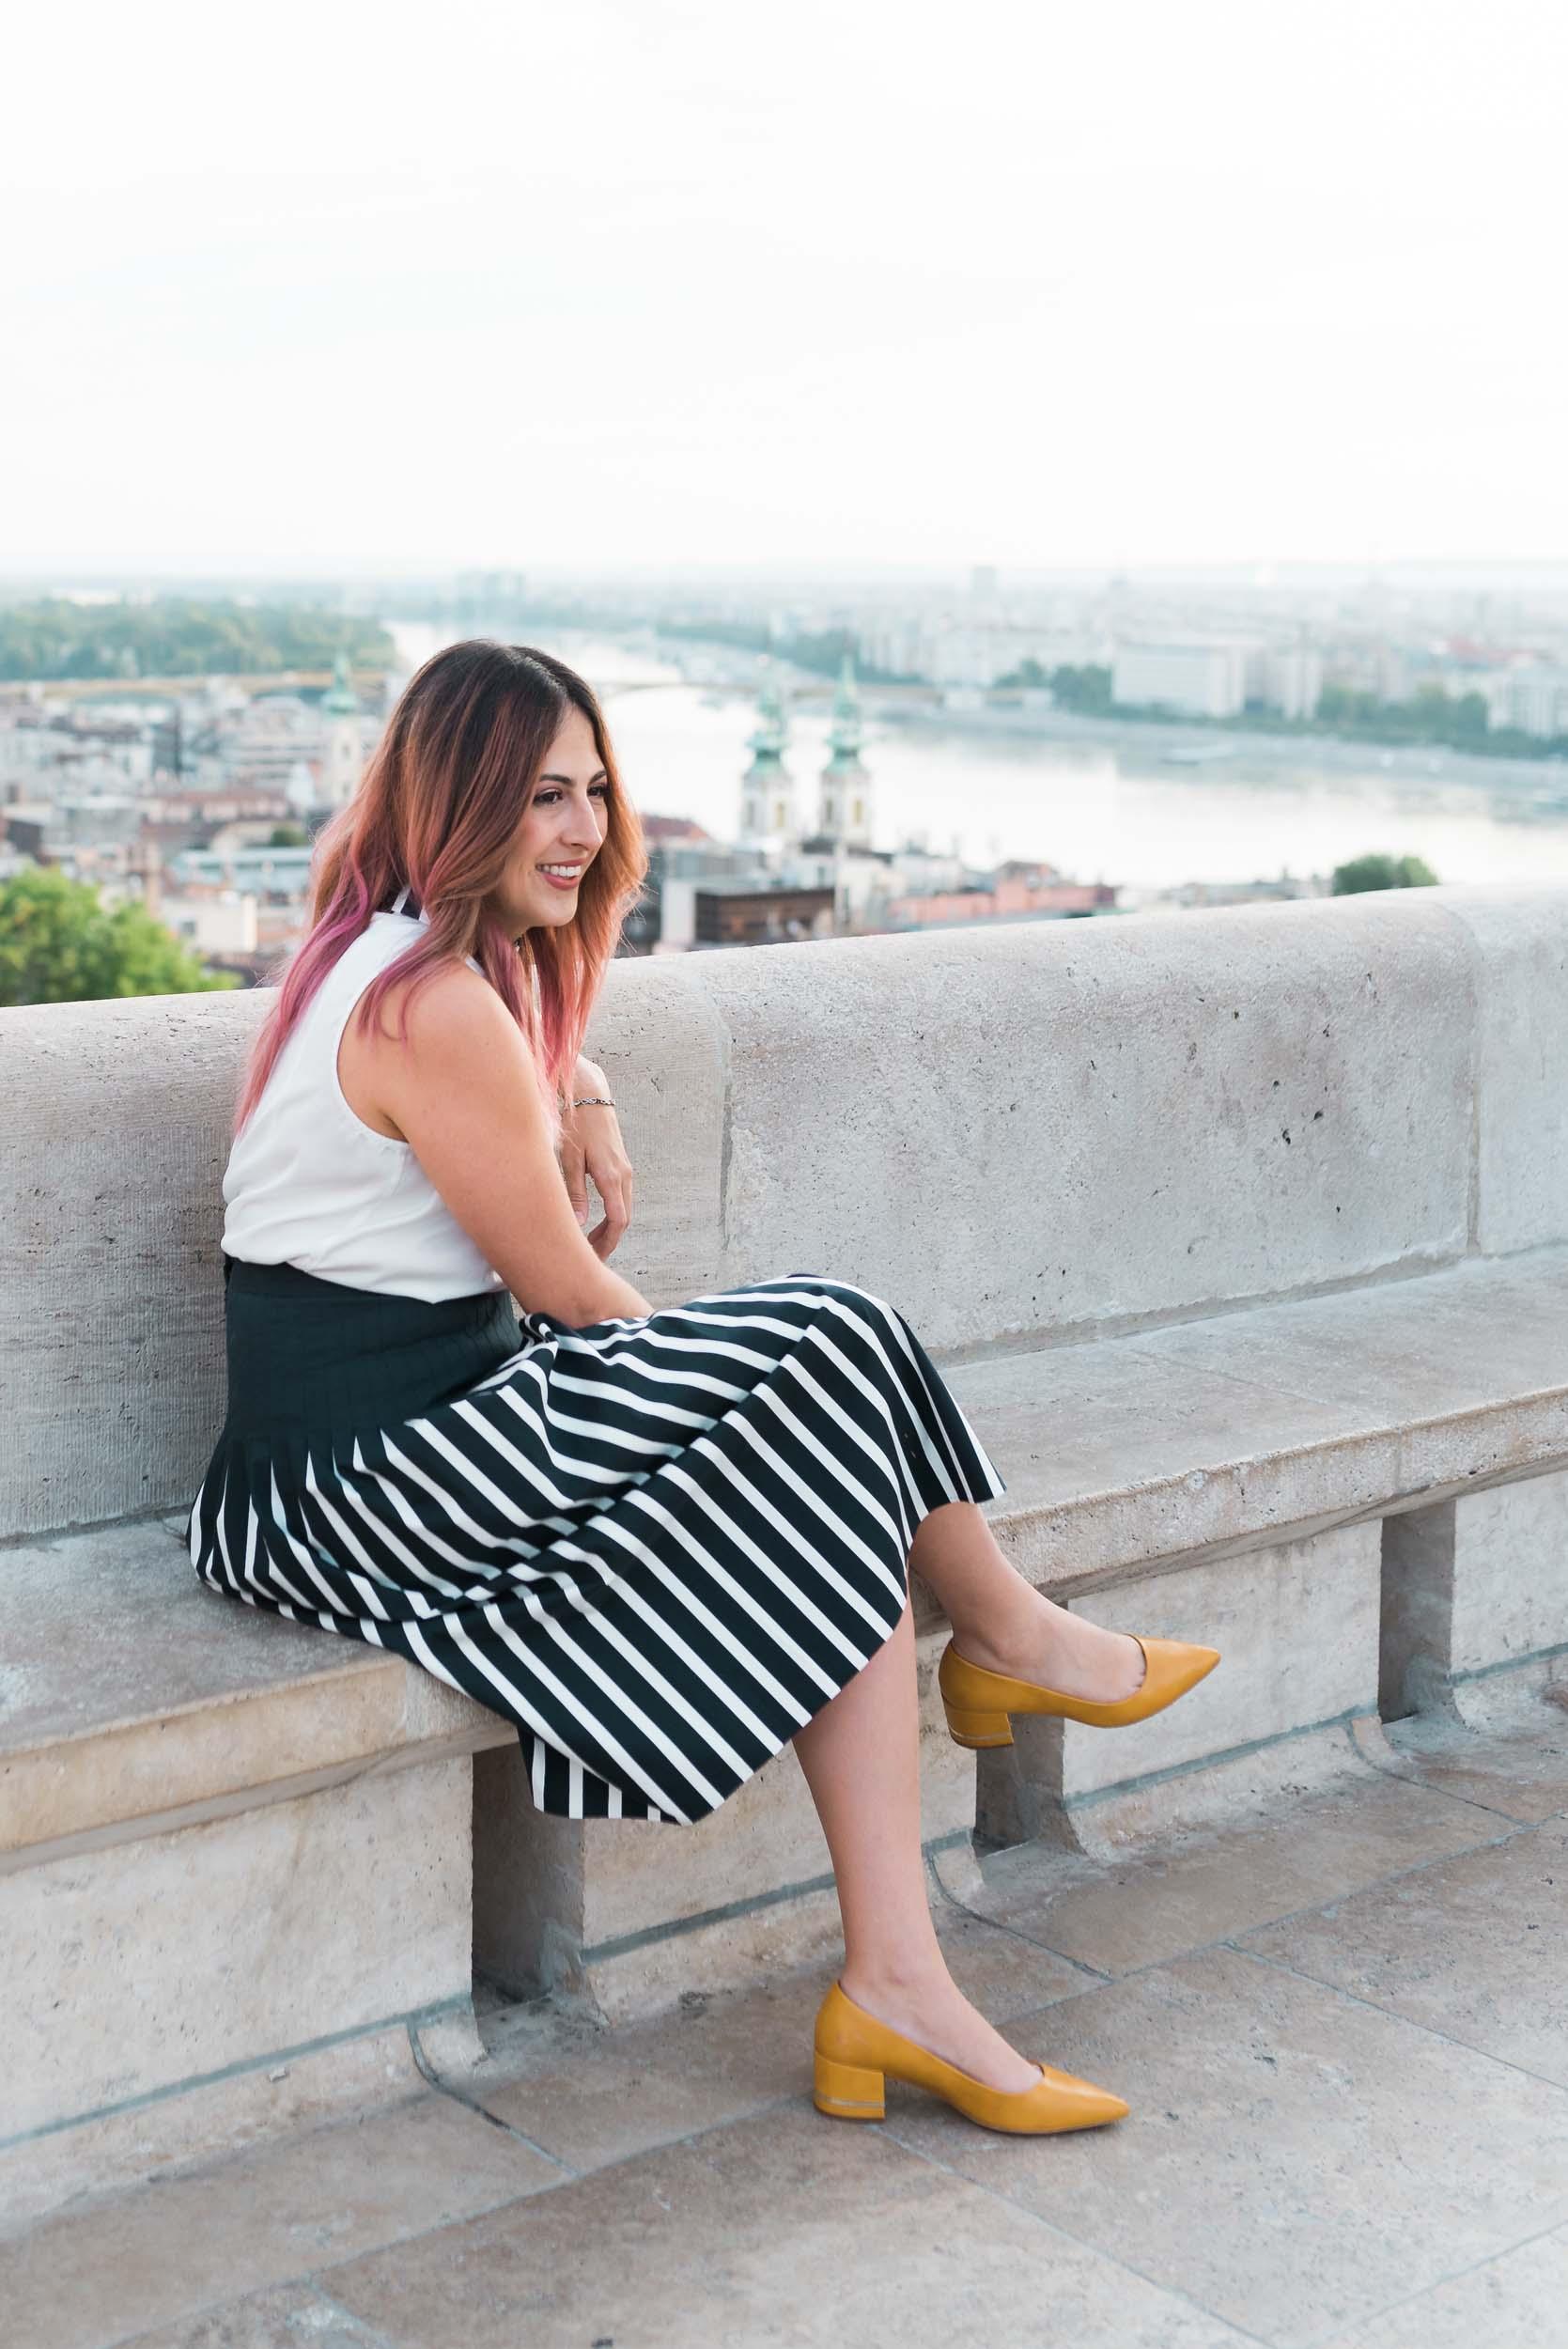 Budapest portrait photographer, brand and marketing photography for creative entrepreneurs